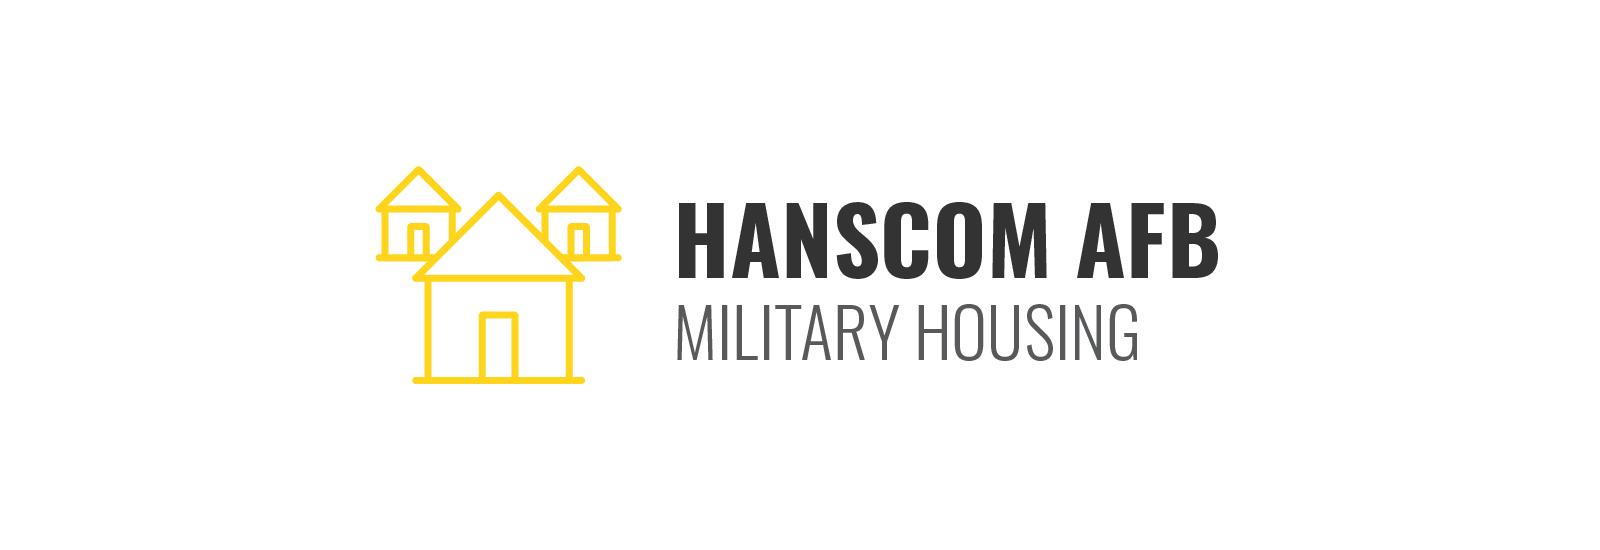 Hanscom AFB Military Housing